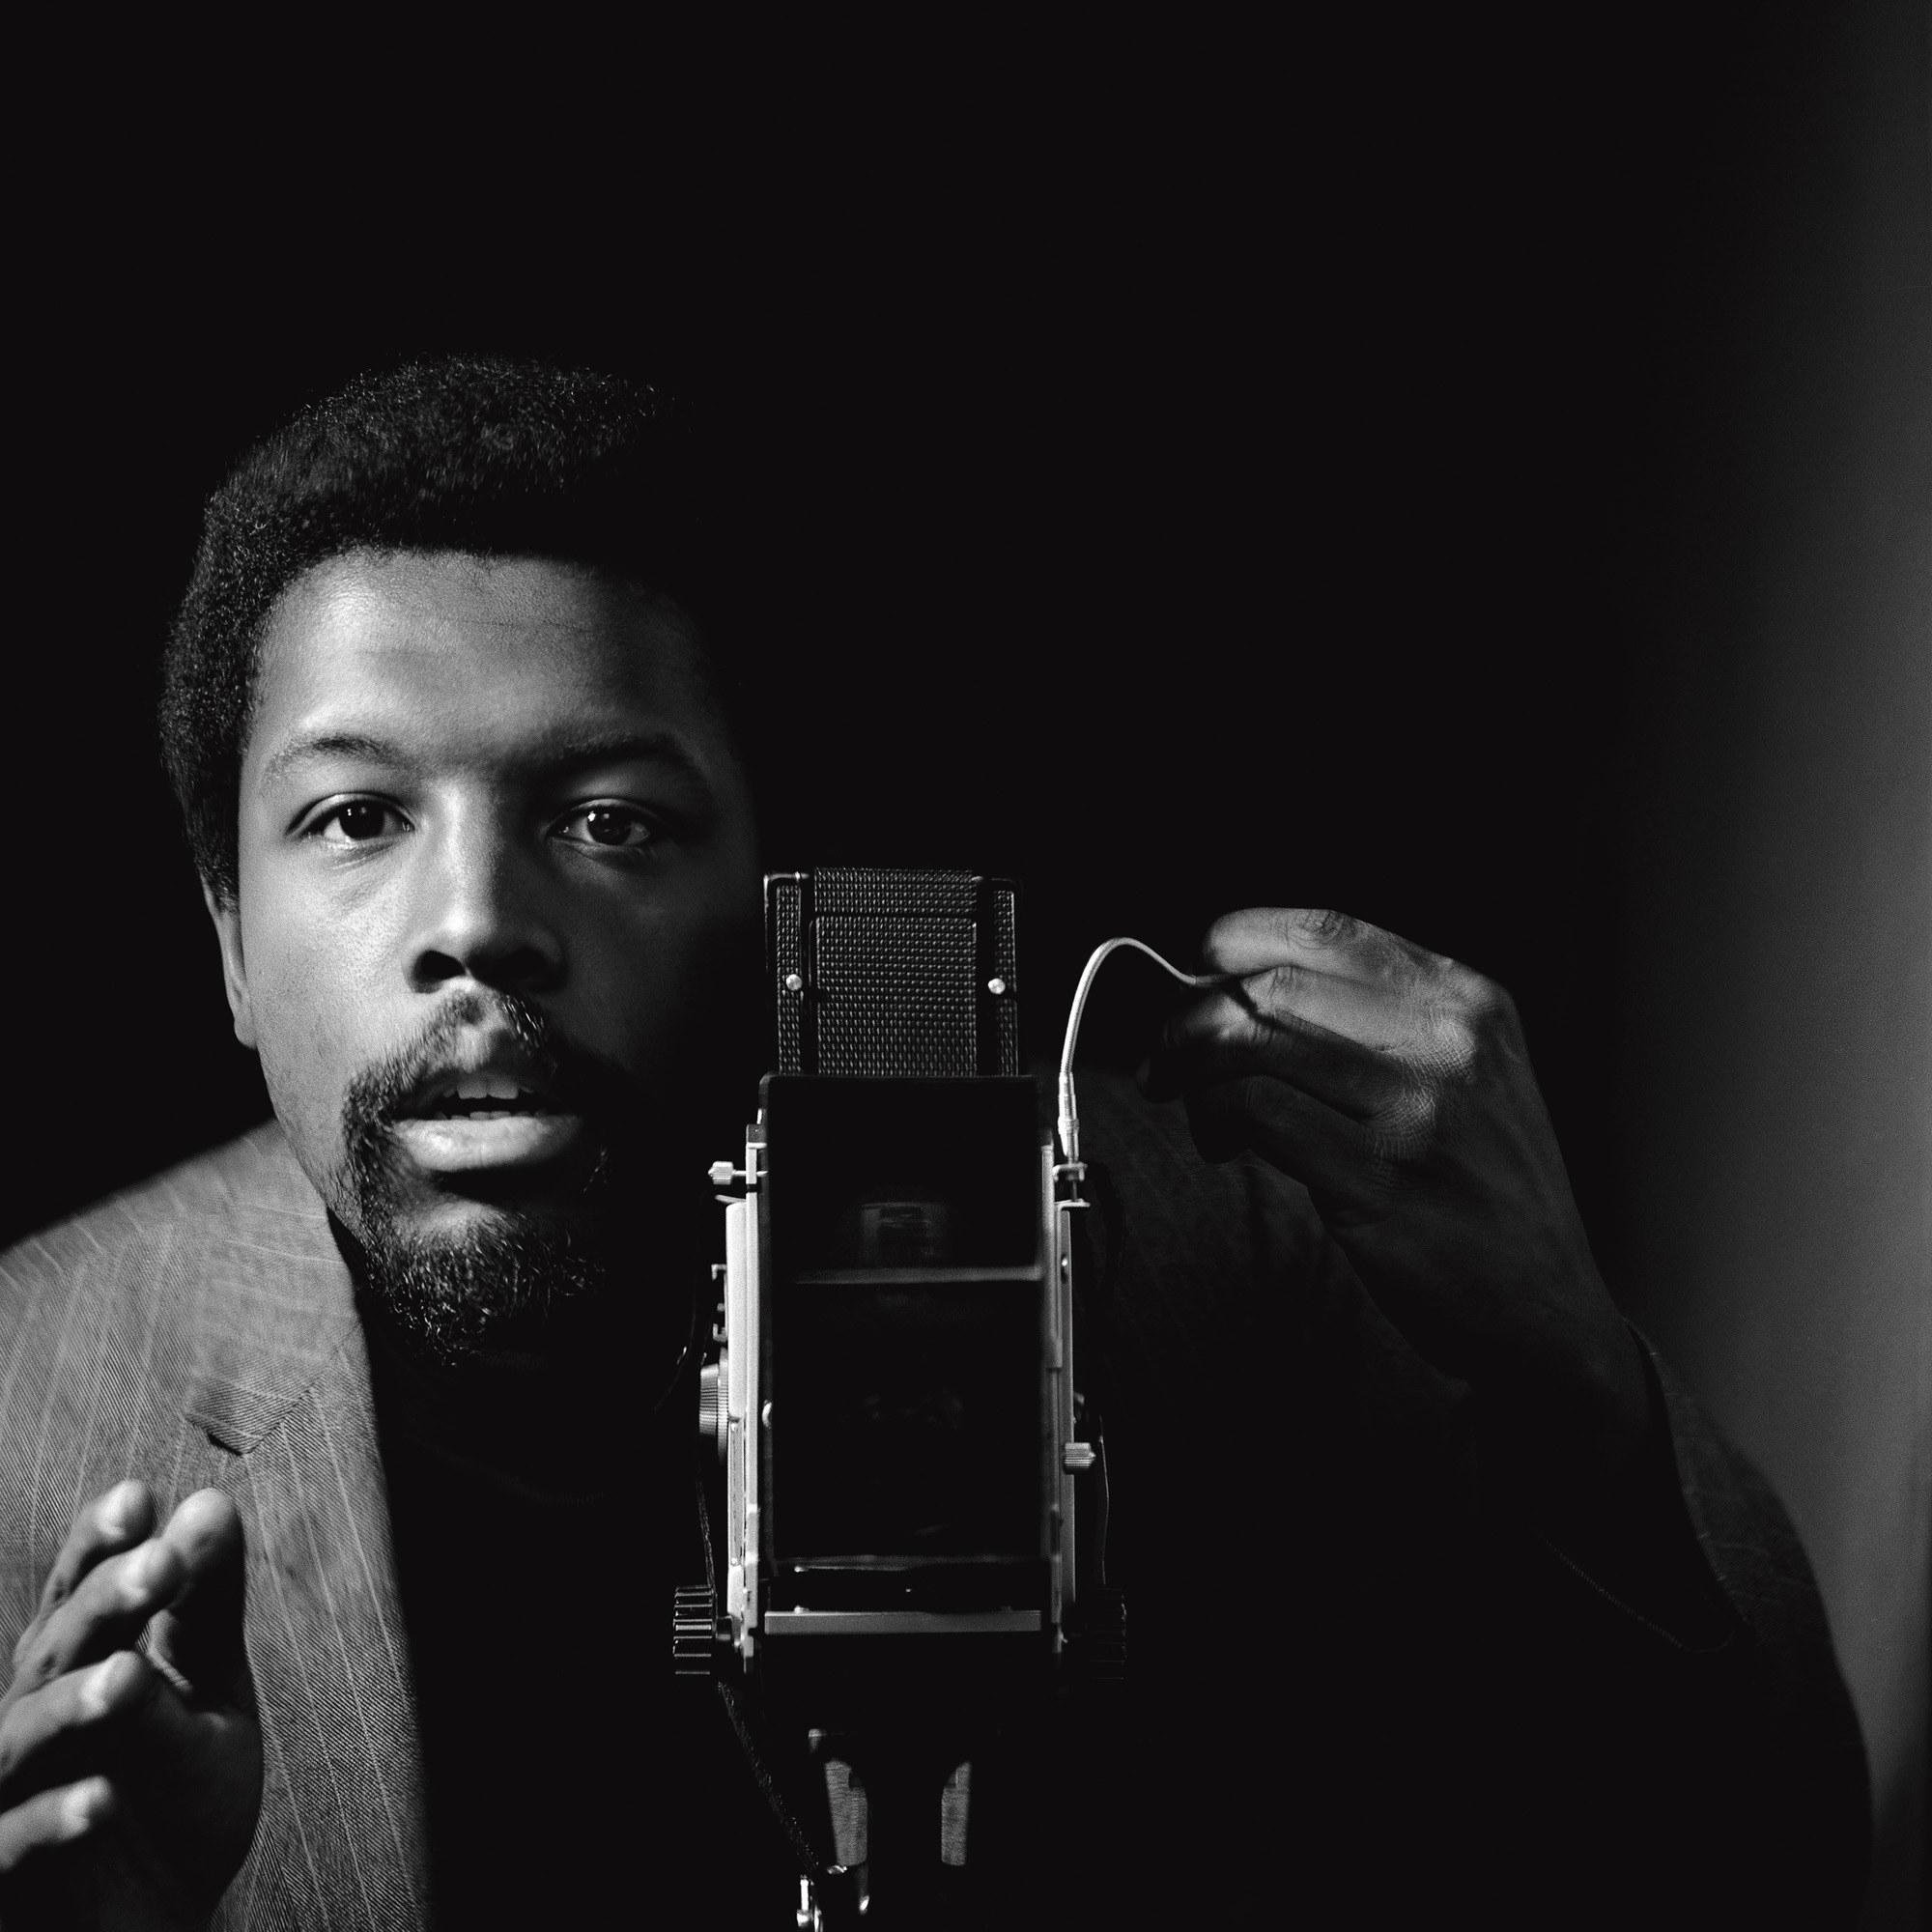 A black-and-white self-portrait of the photographer Kwame Brathwaite, circa 1964, taken in Harlem